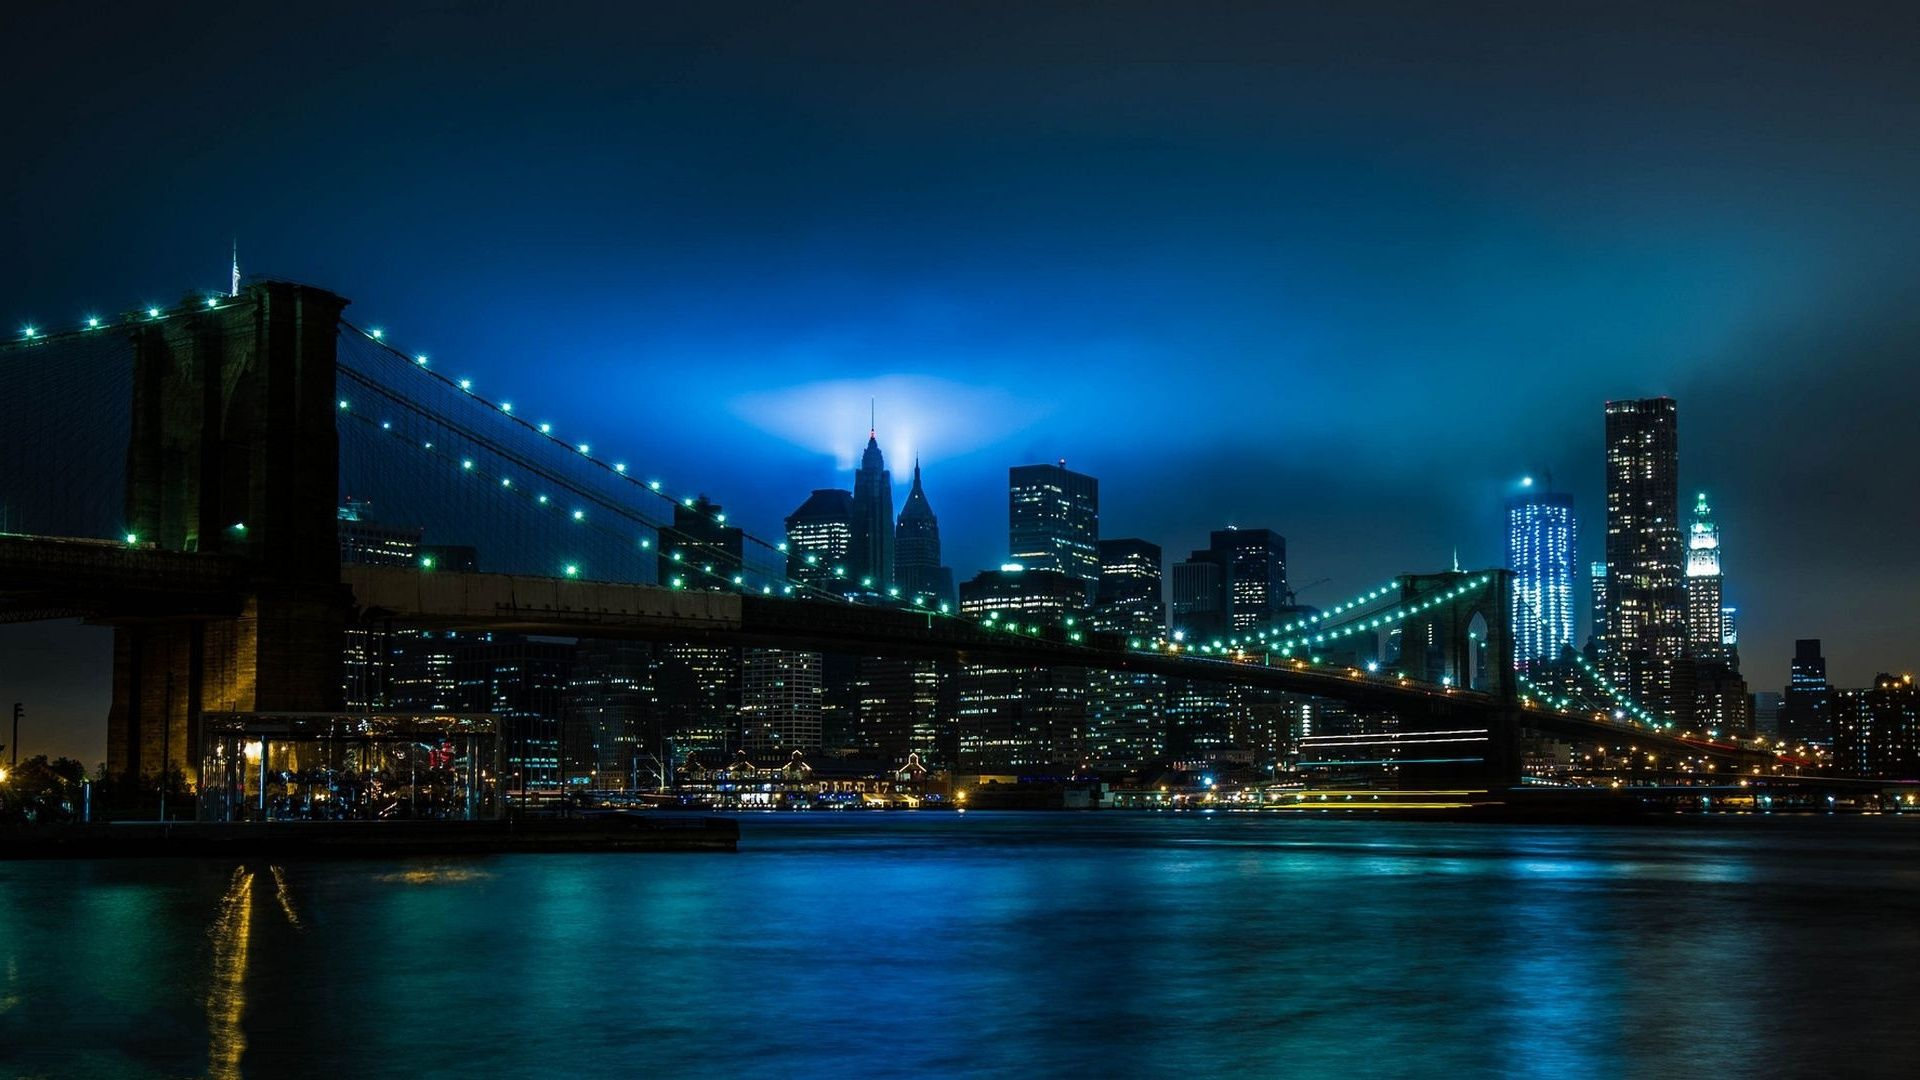 Brooklyn Bridge At Night Background Bridge Wallpaper New York Night New York Wallpaper